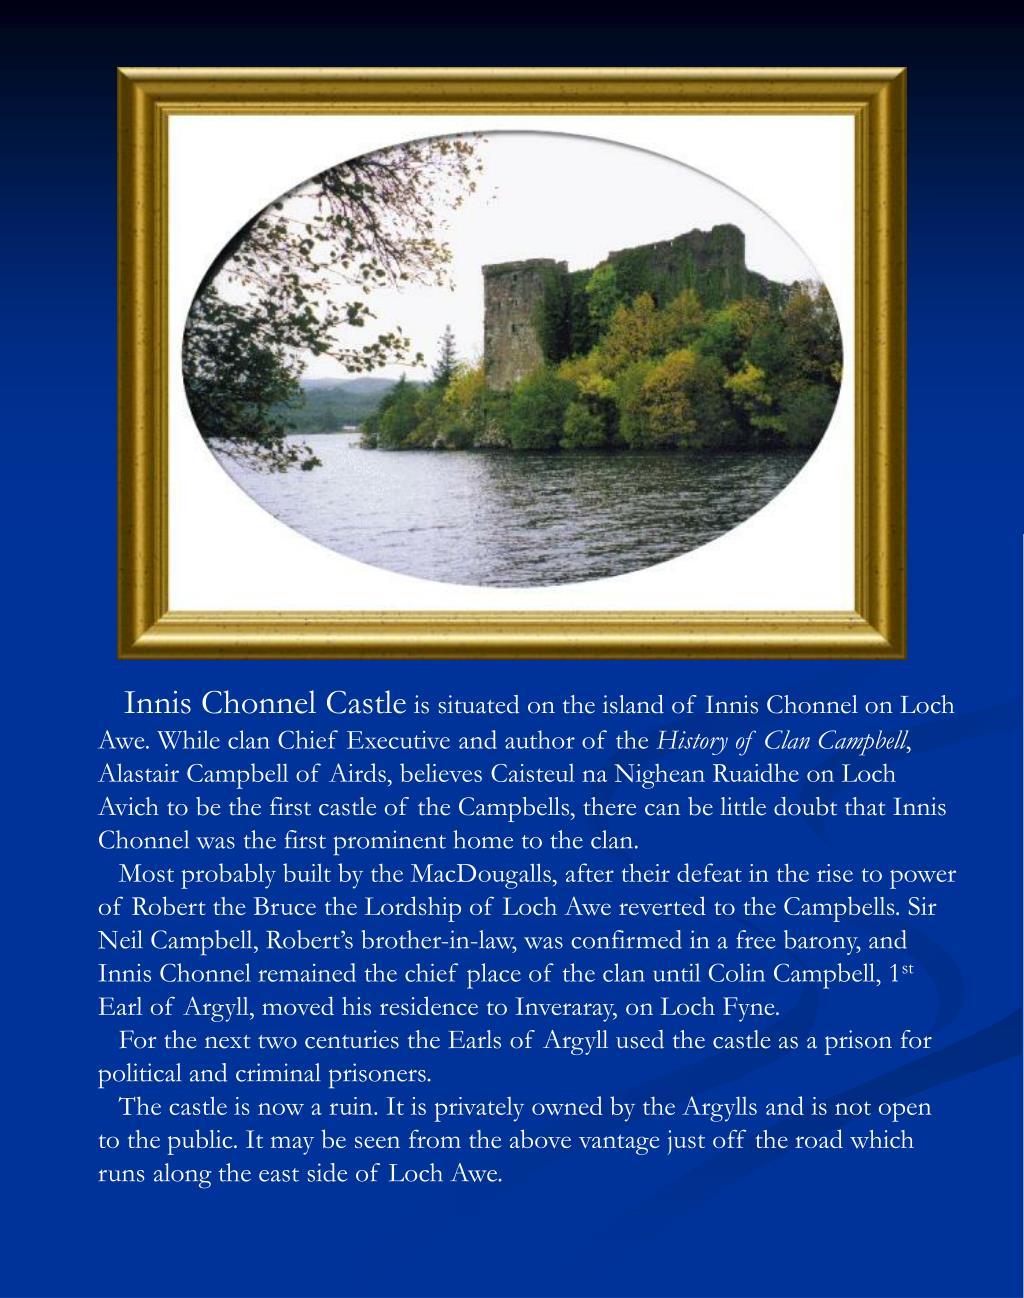 Innis Chonnel Castle